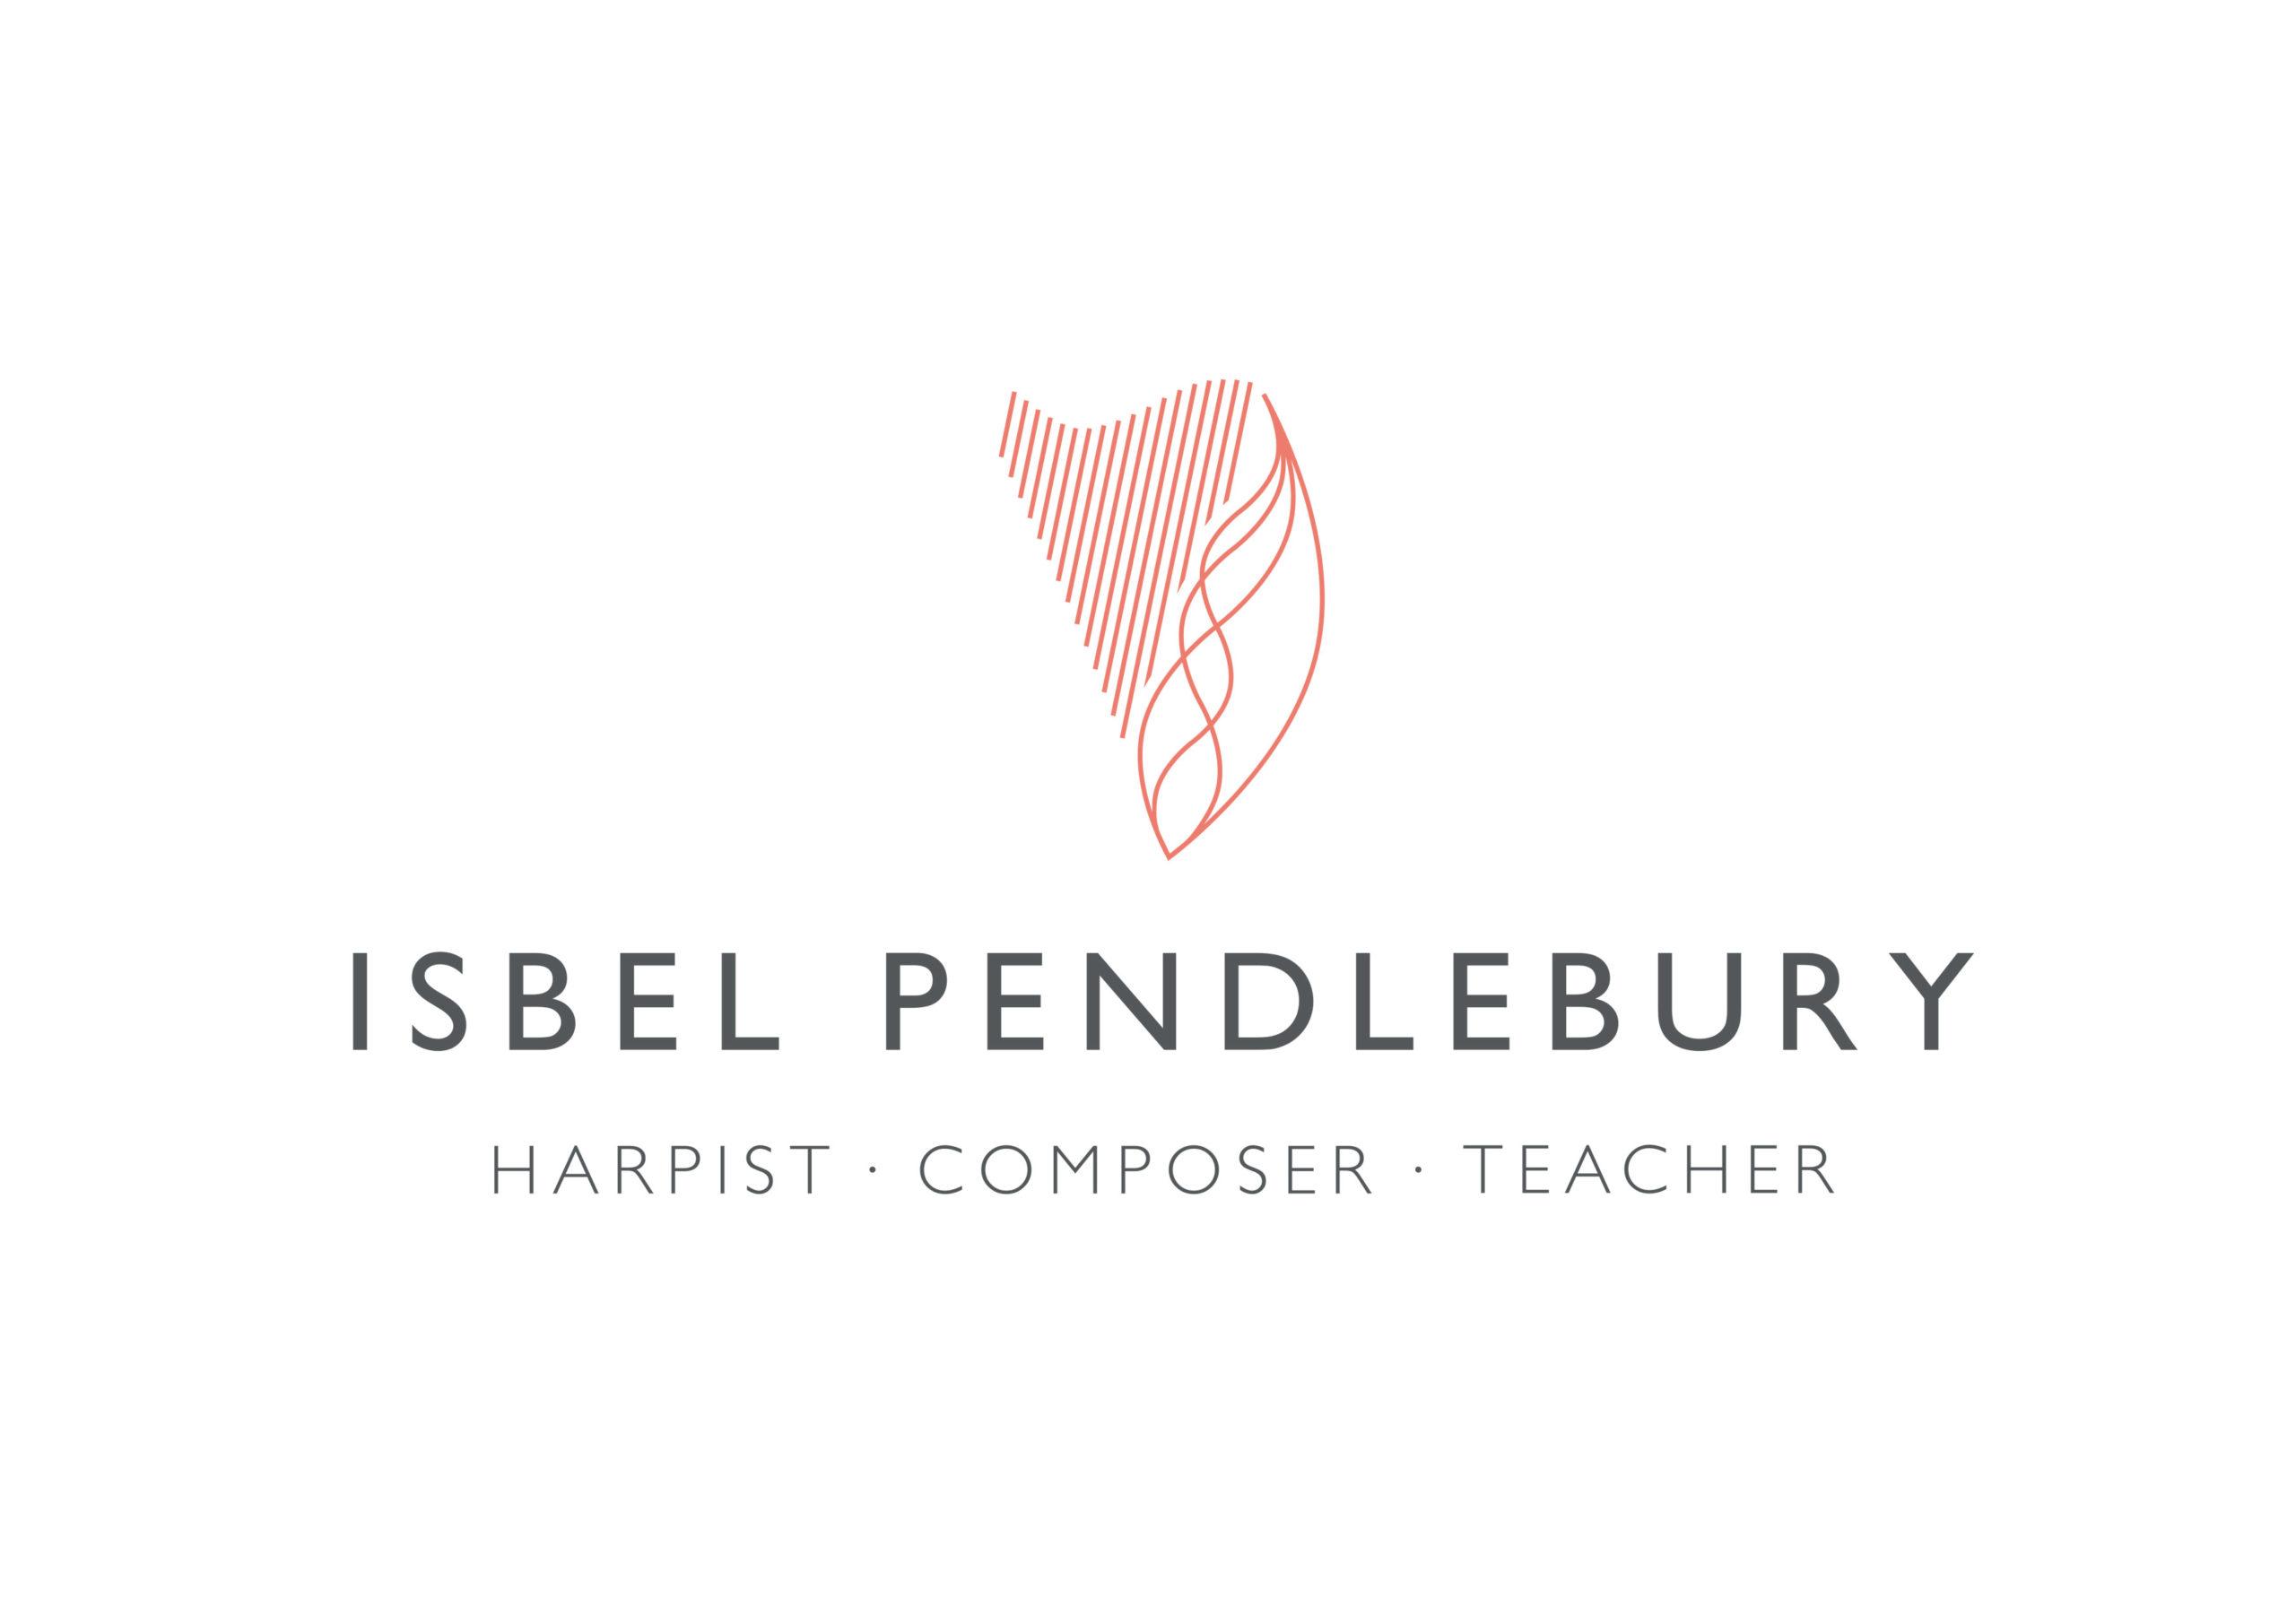 Isbel Pendlebury logo